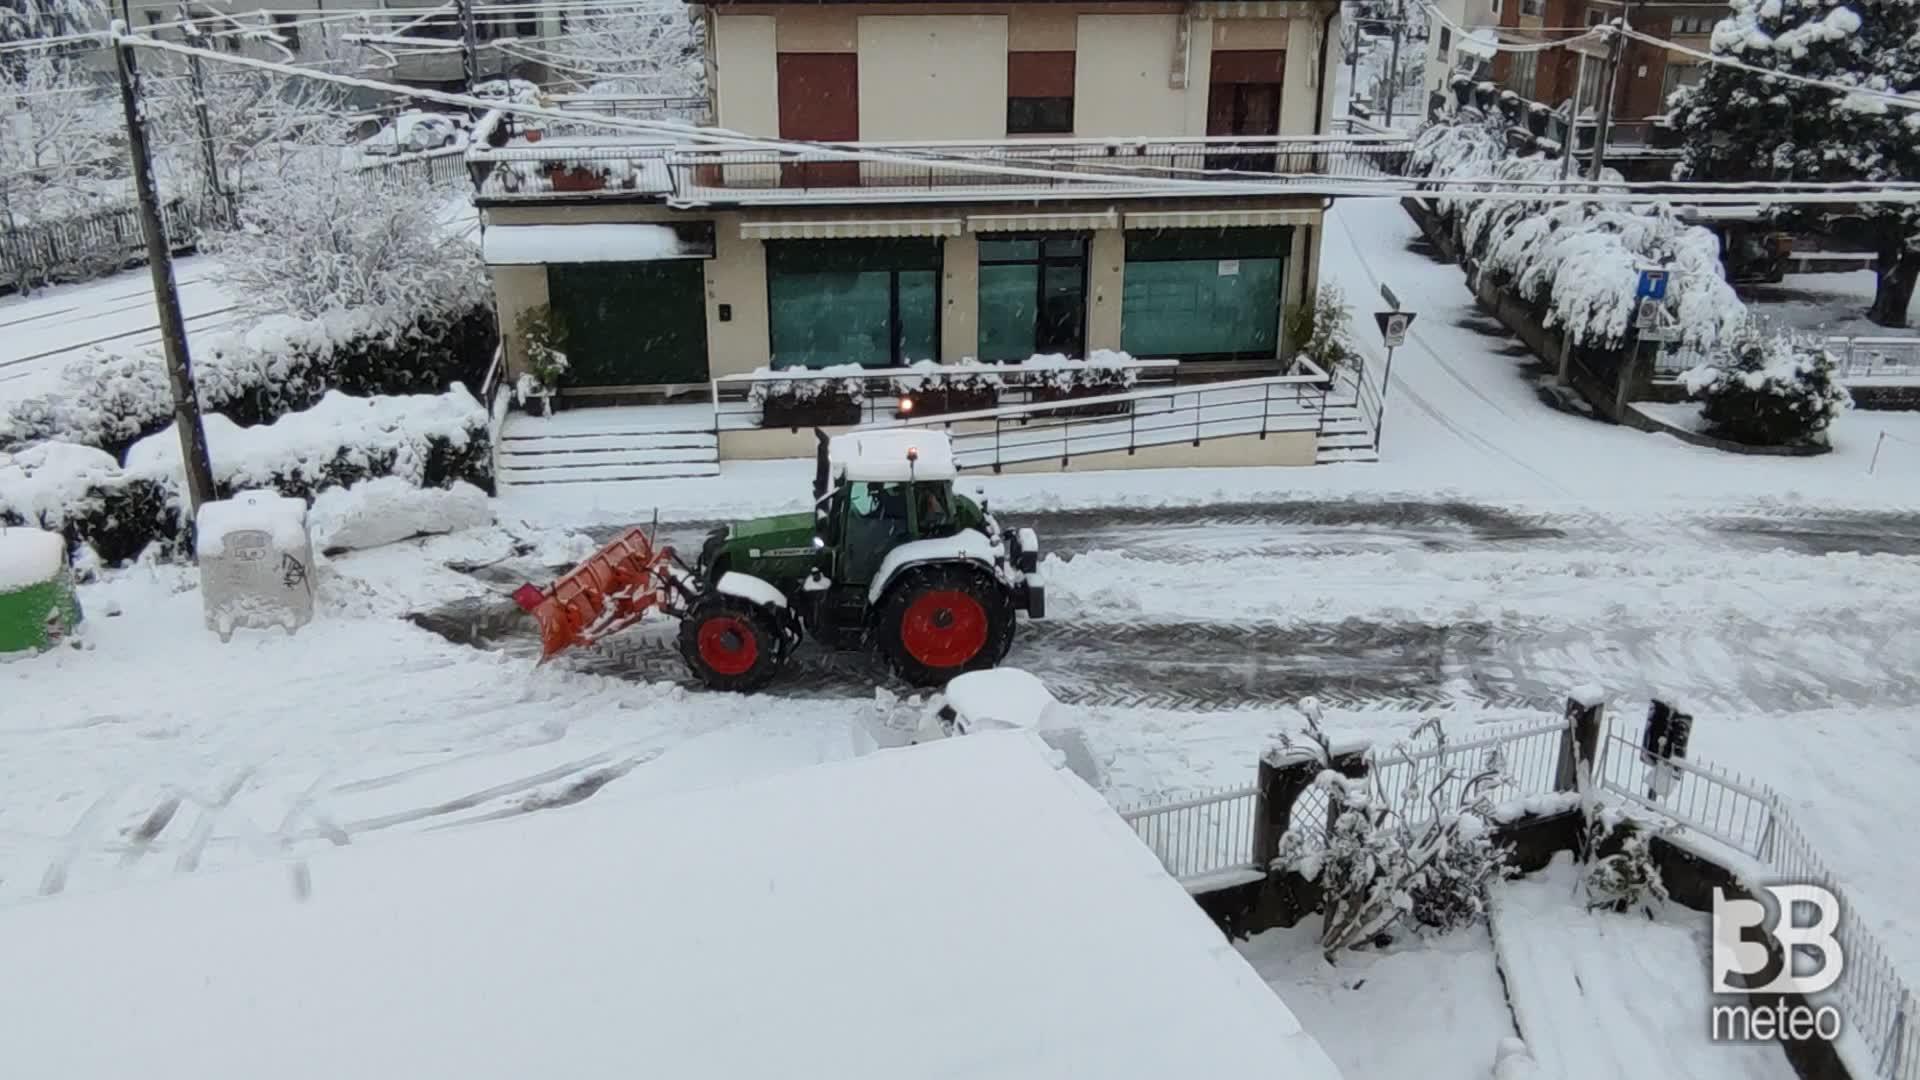 CRONACA METEO DIRETTA - Lunedì 28 dicembre, NEVE abbondante a Vicenza - VIDEO